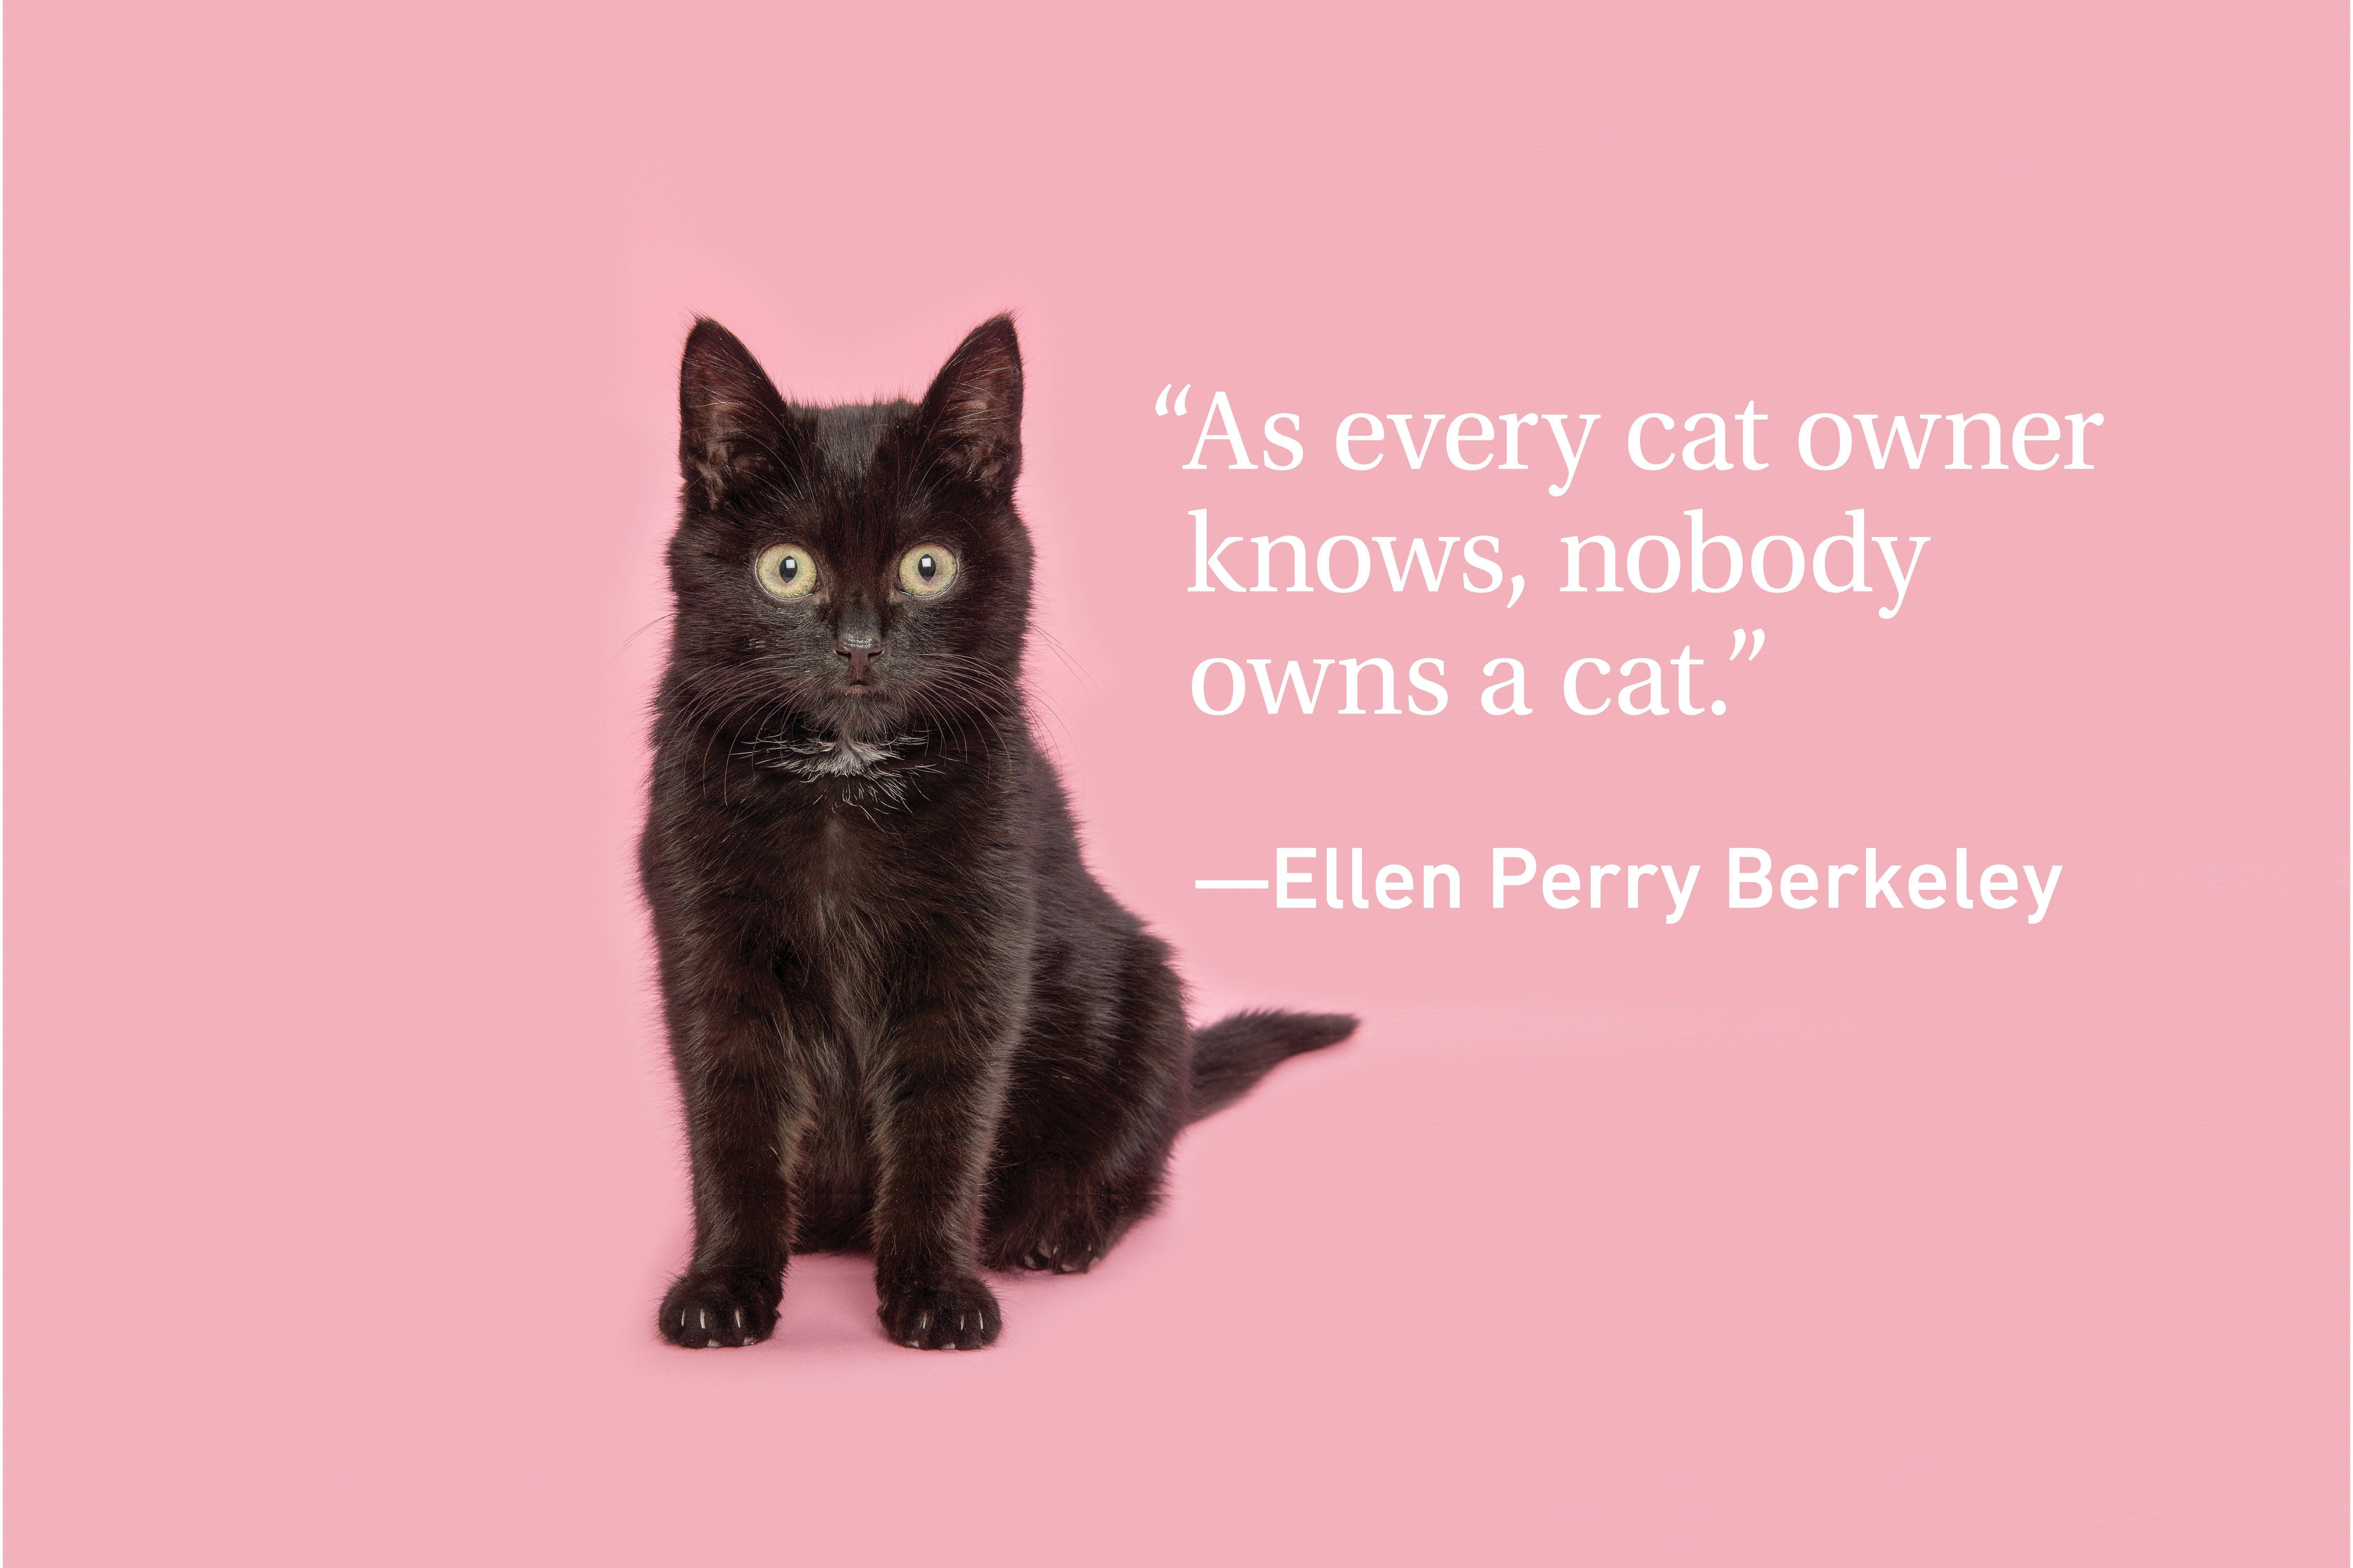 Black cat on pink background